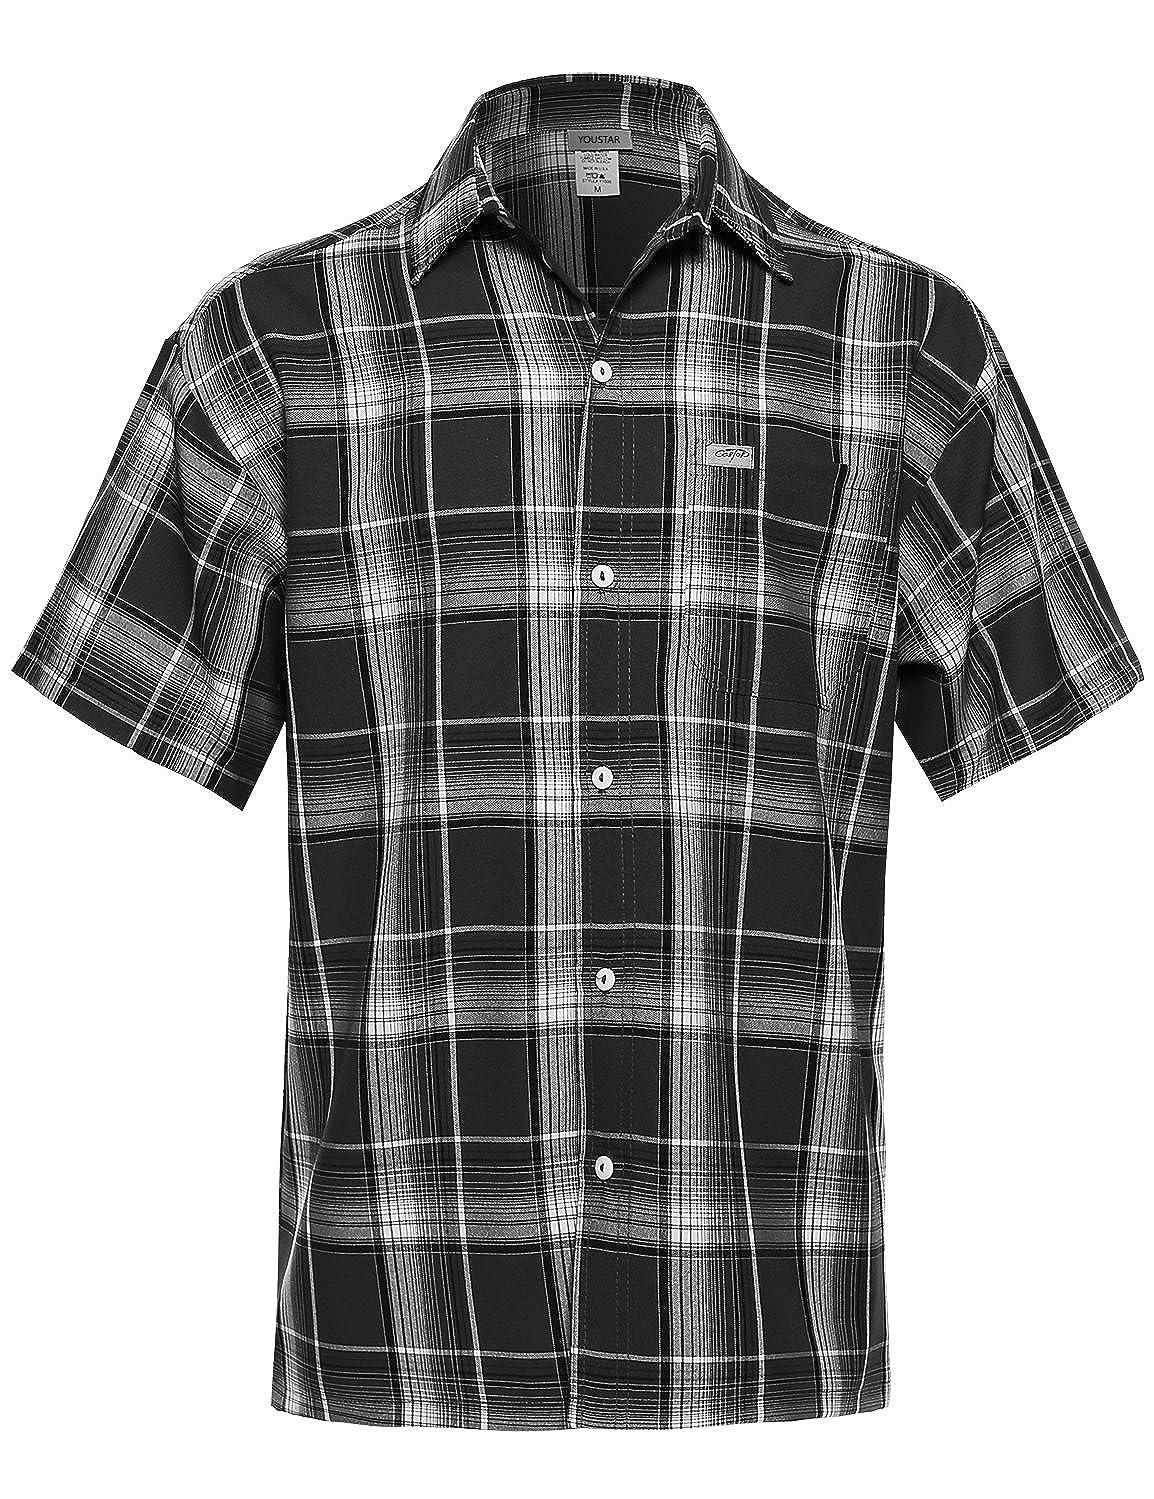 Youstar Men's Western Casual Button Down Shirt